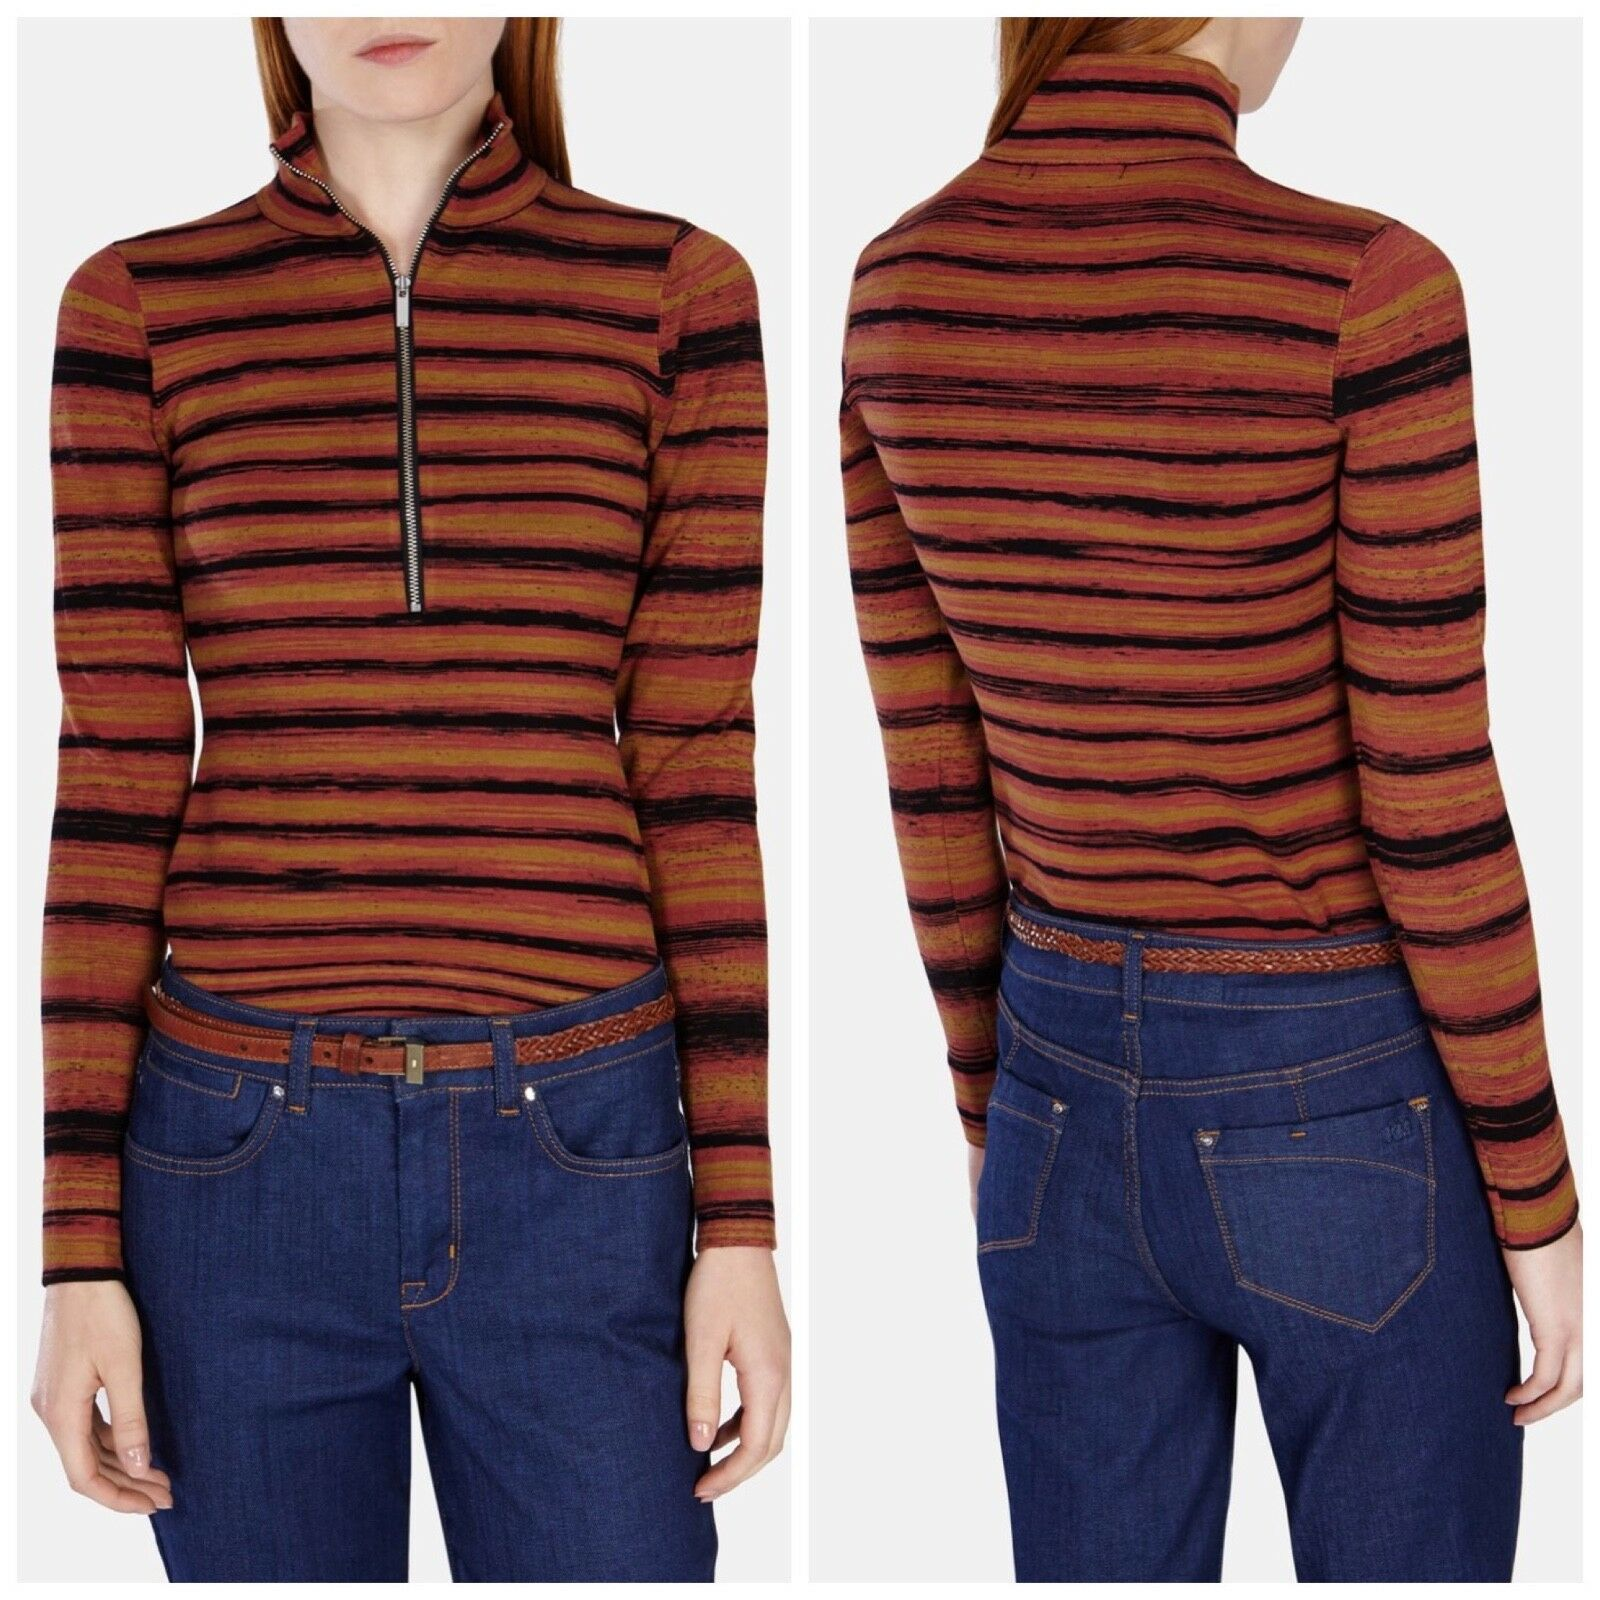 New Karen Millen Lightweight Space Space Space Dye sweater (Size XS) 15c2ae